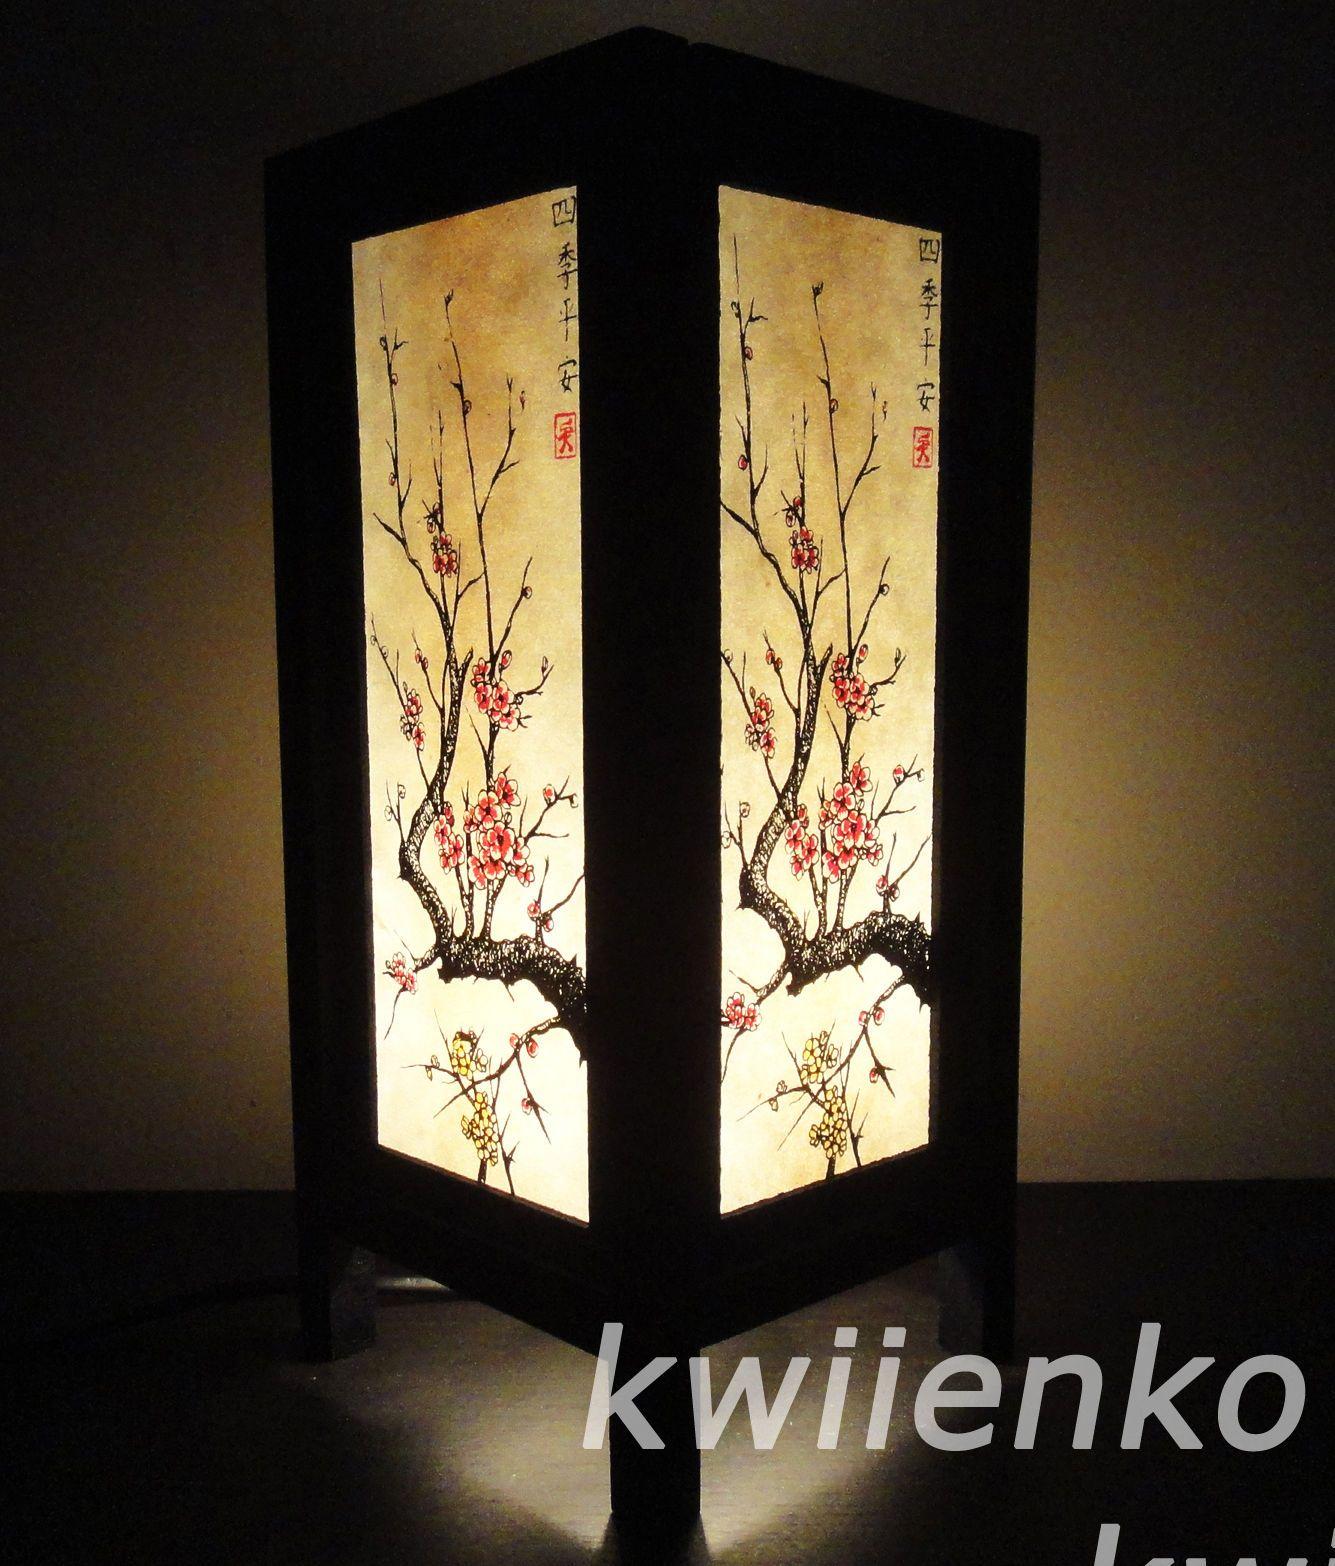 Asian Oriental Japanese Sakura Cherry Blossom Tree Branch Art Bedside Table Lamp Tree Branch Art Asian Lamps Bedside Table Lamps